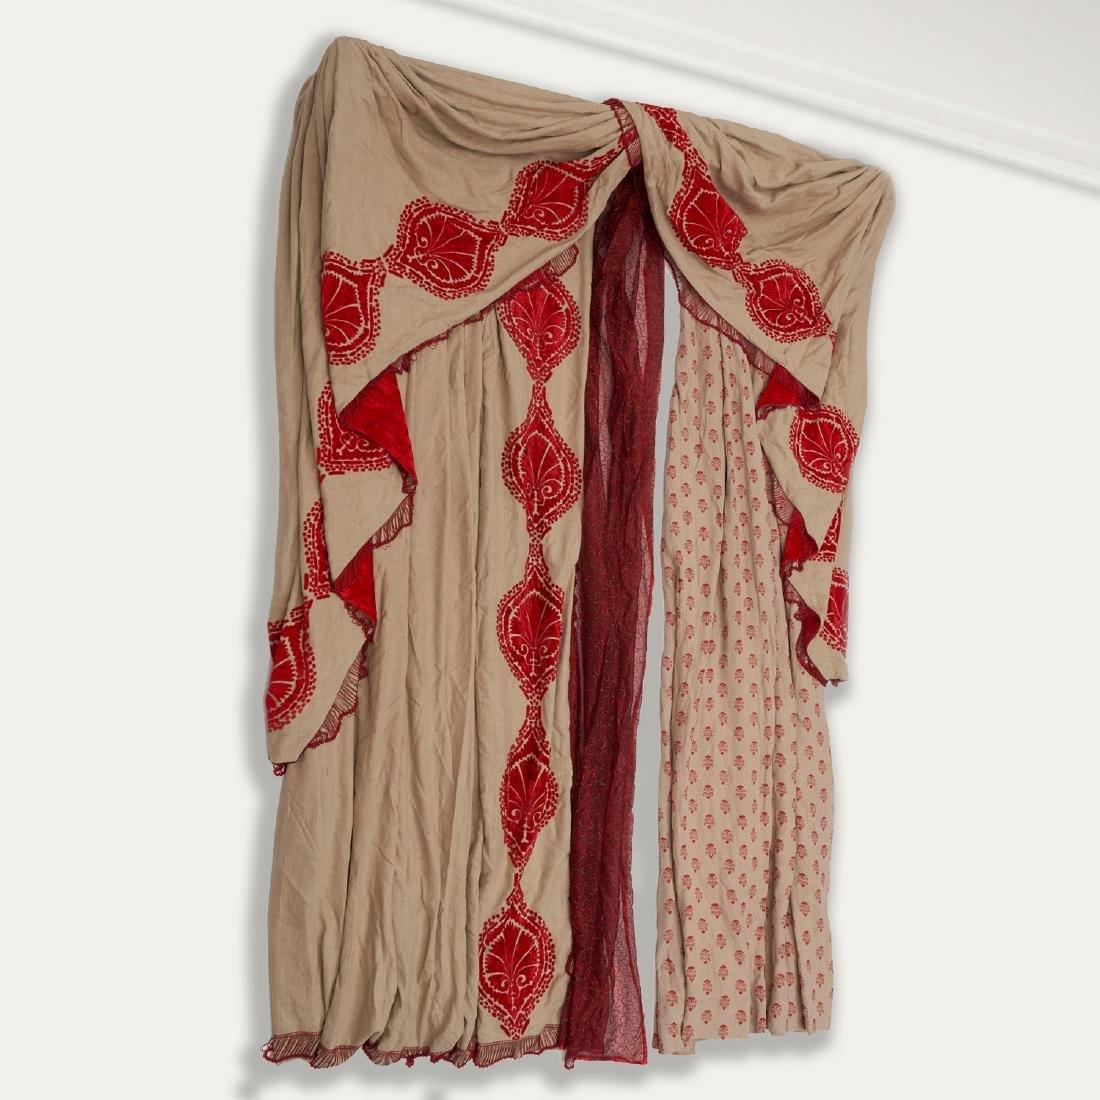 (4) fine drapery panels with cornice